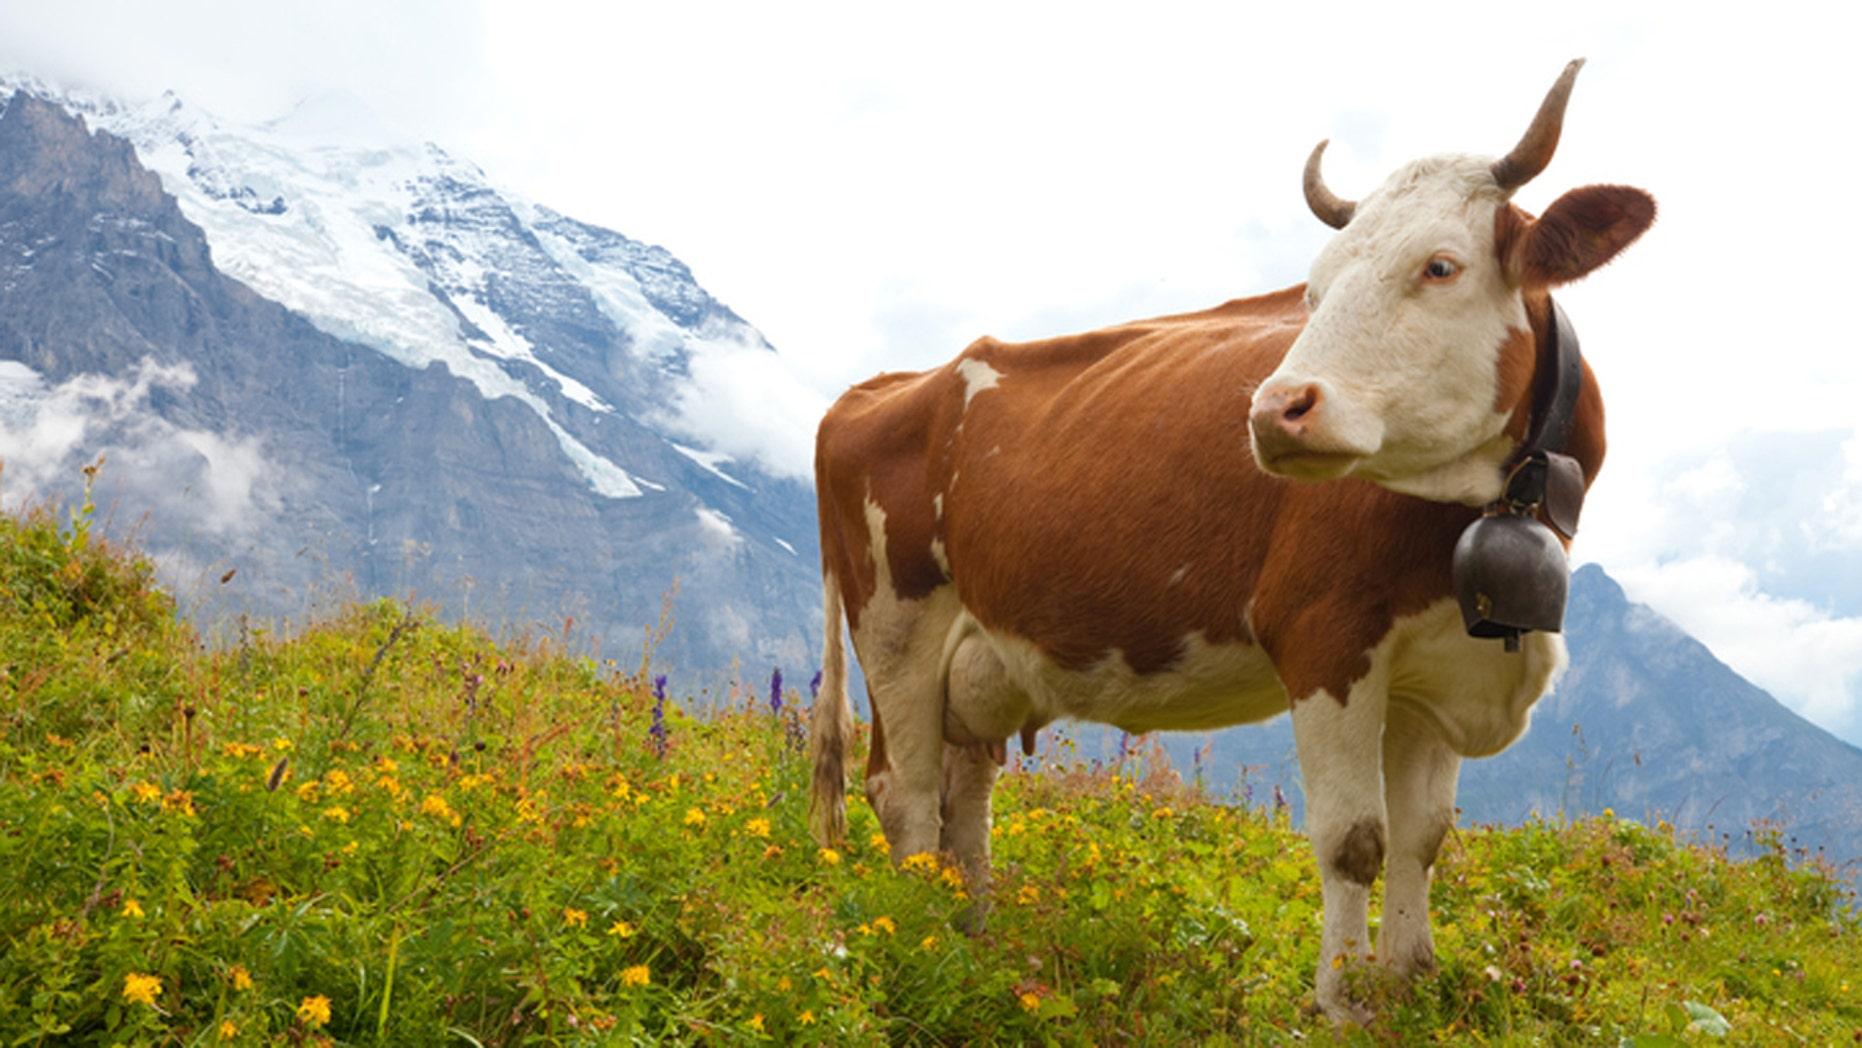 Are cowbells inhumane?